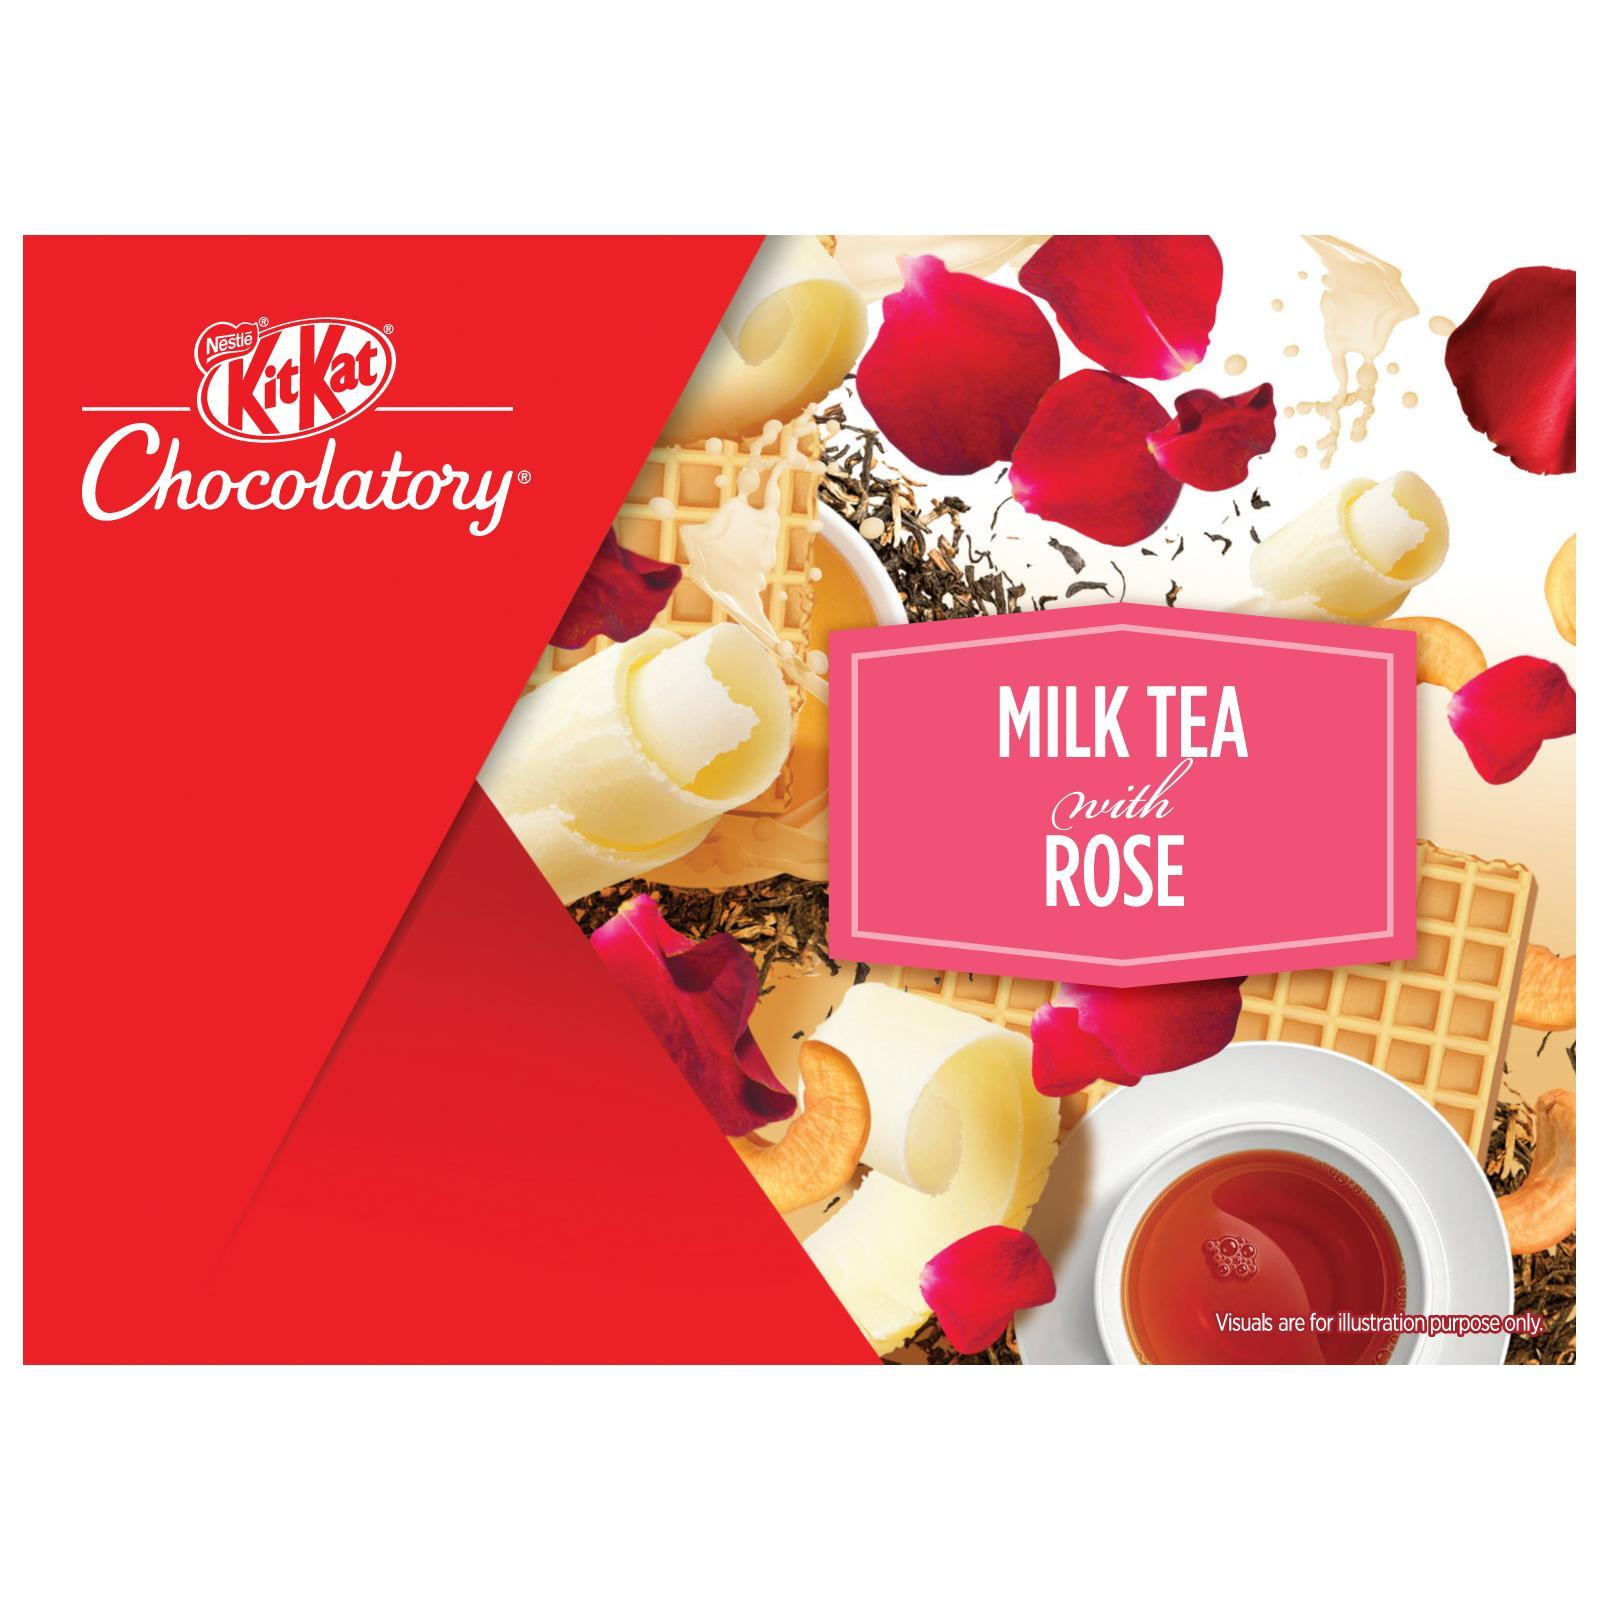 NESTLE KIT KAT Chocolatory Milk Tea with Rose (Special Edition)